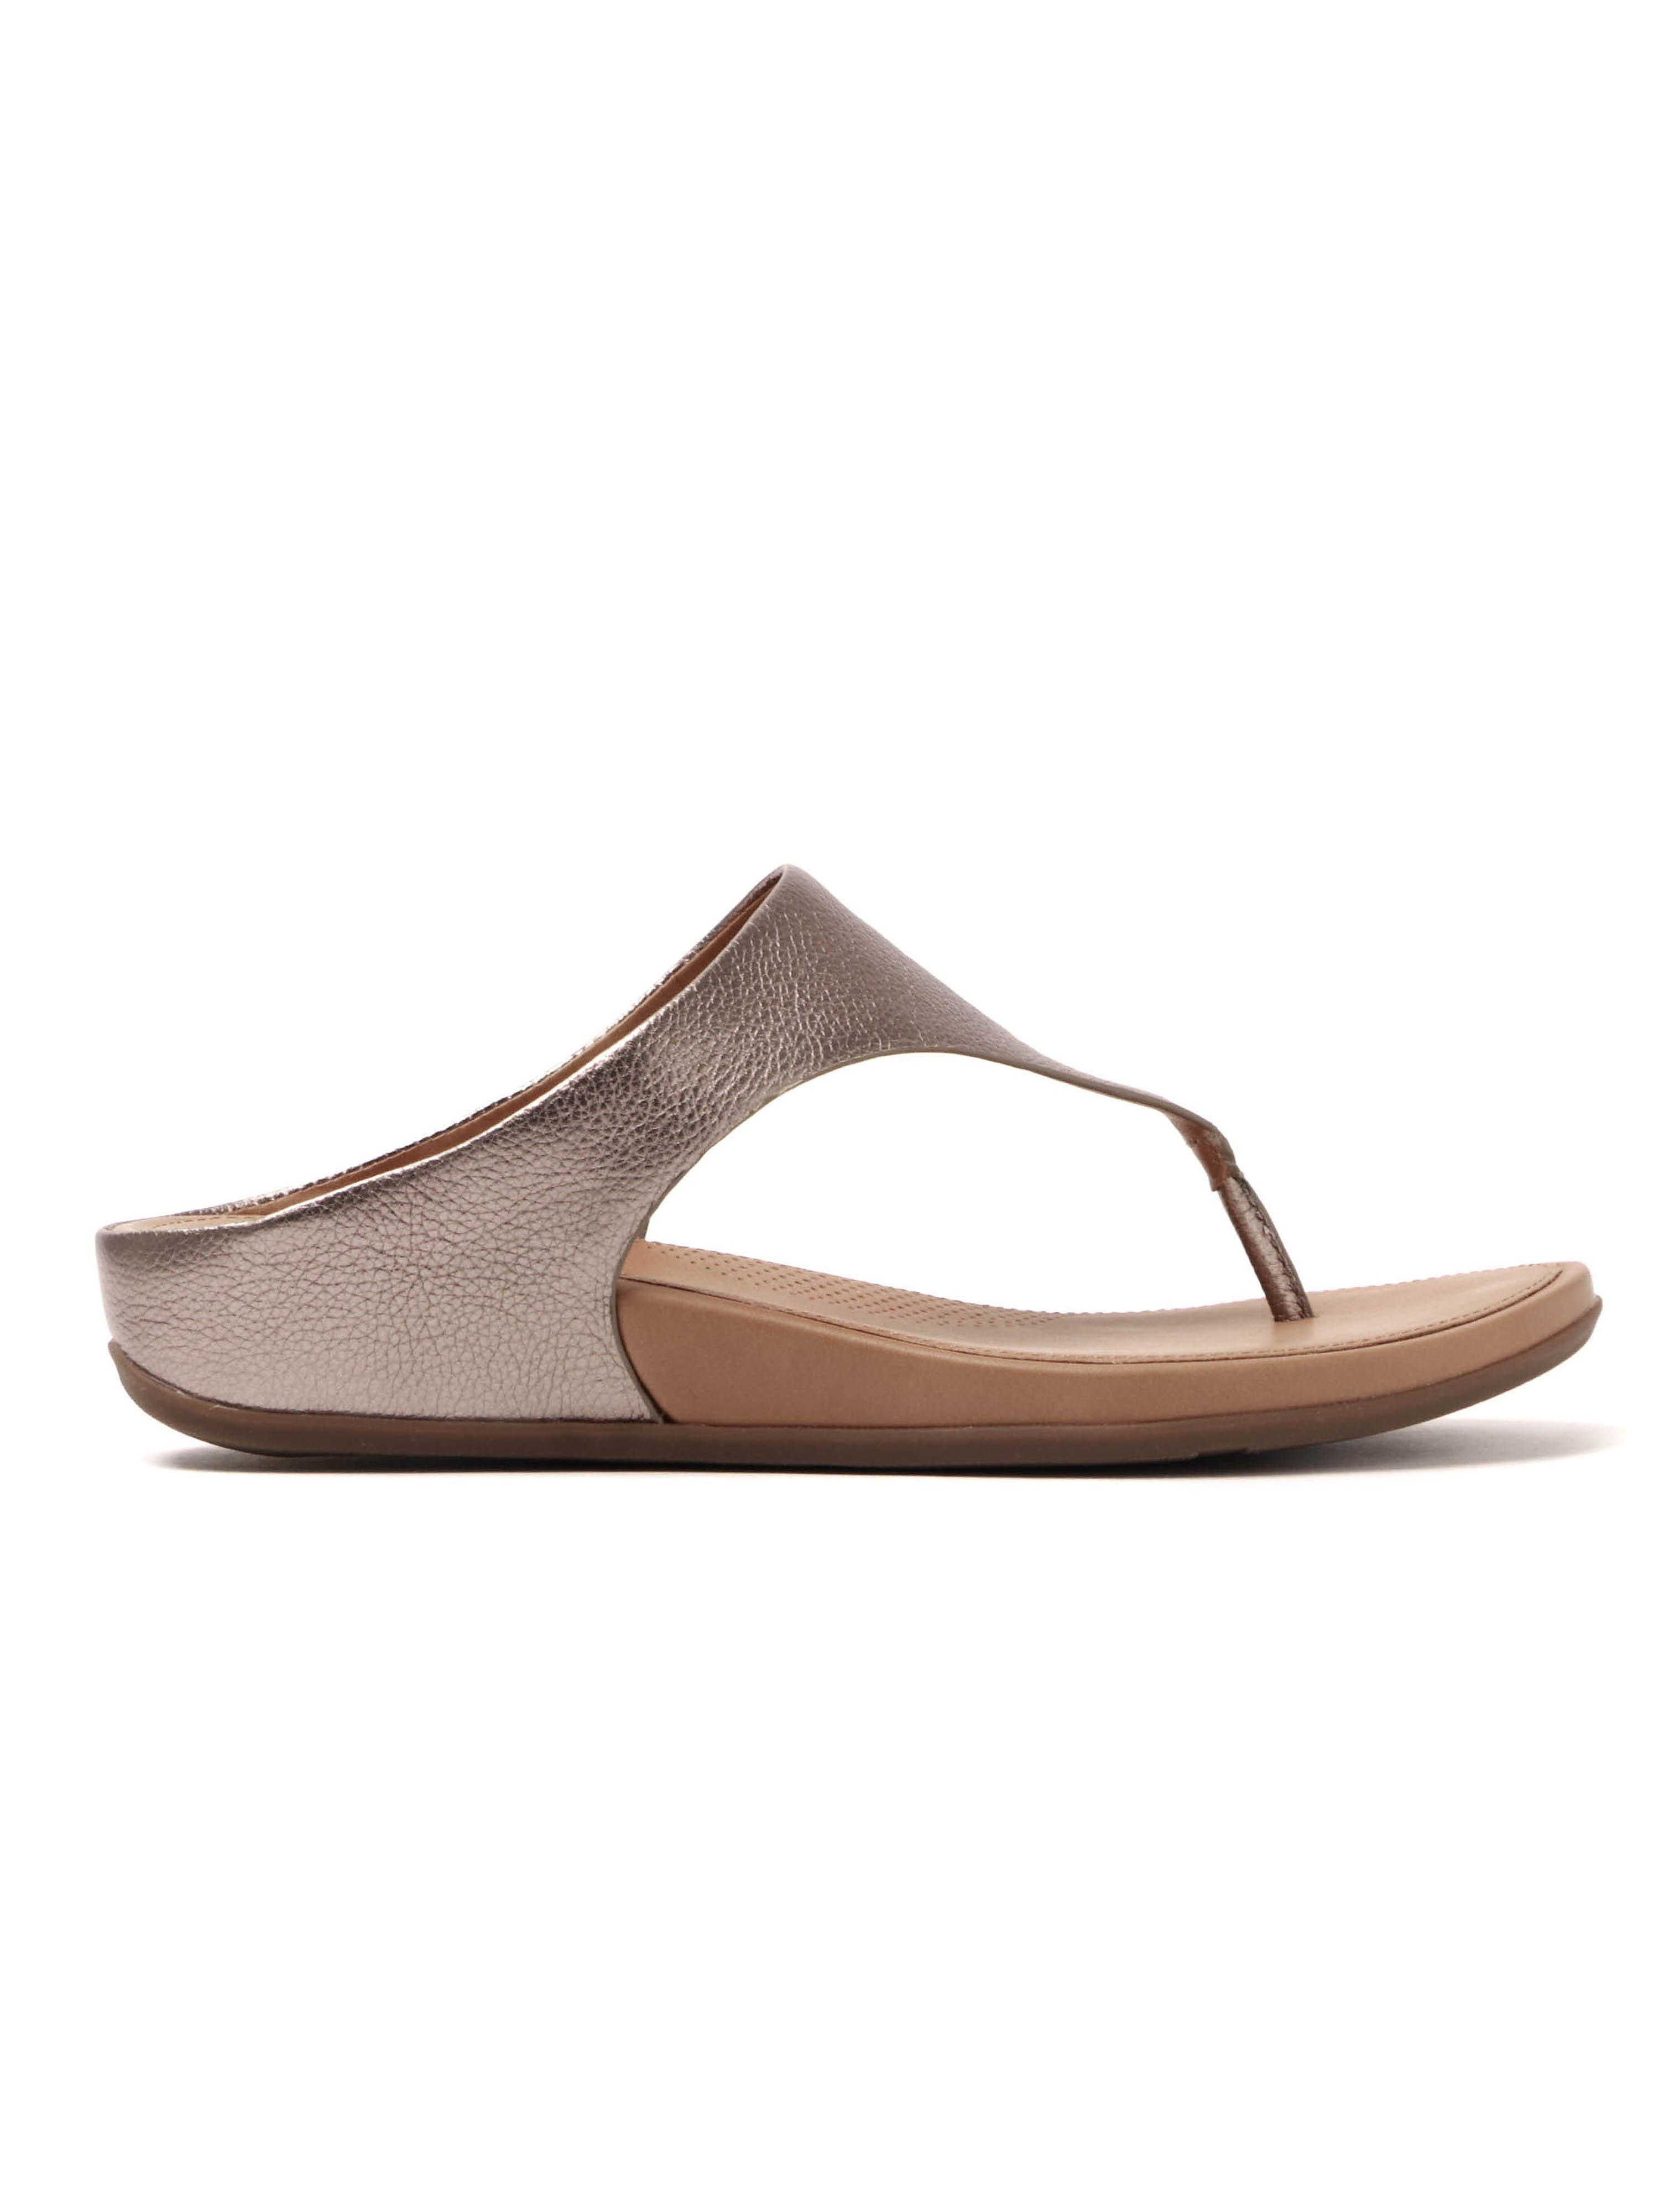 FitFlop Women's Banda Metallic Toe-Post Sandals - Bronze Leather